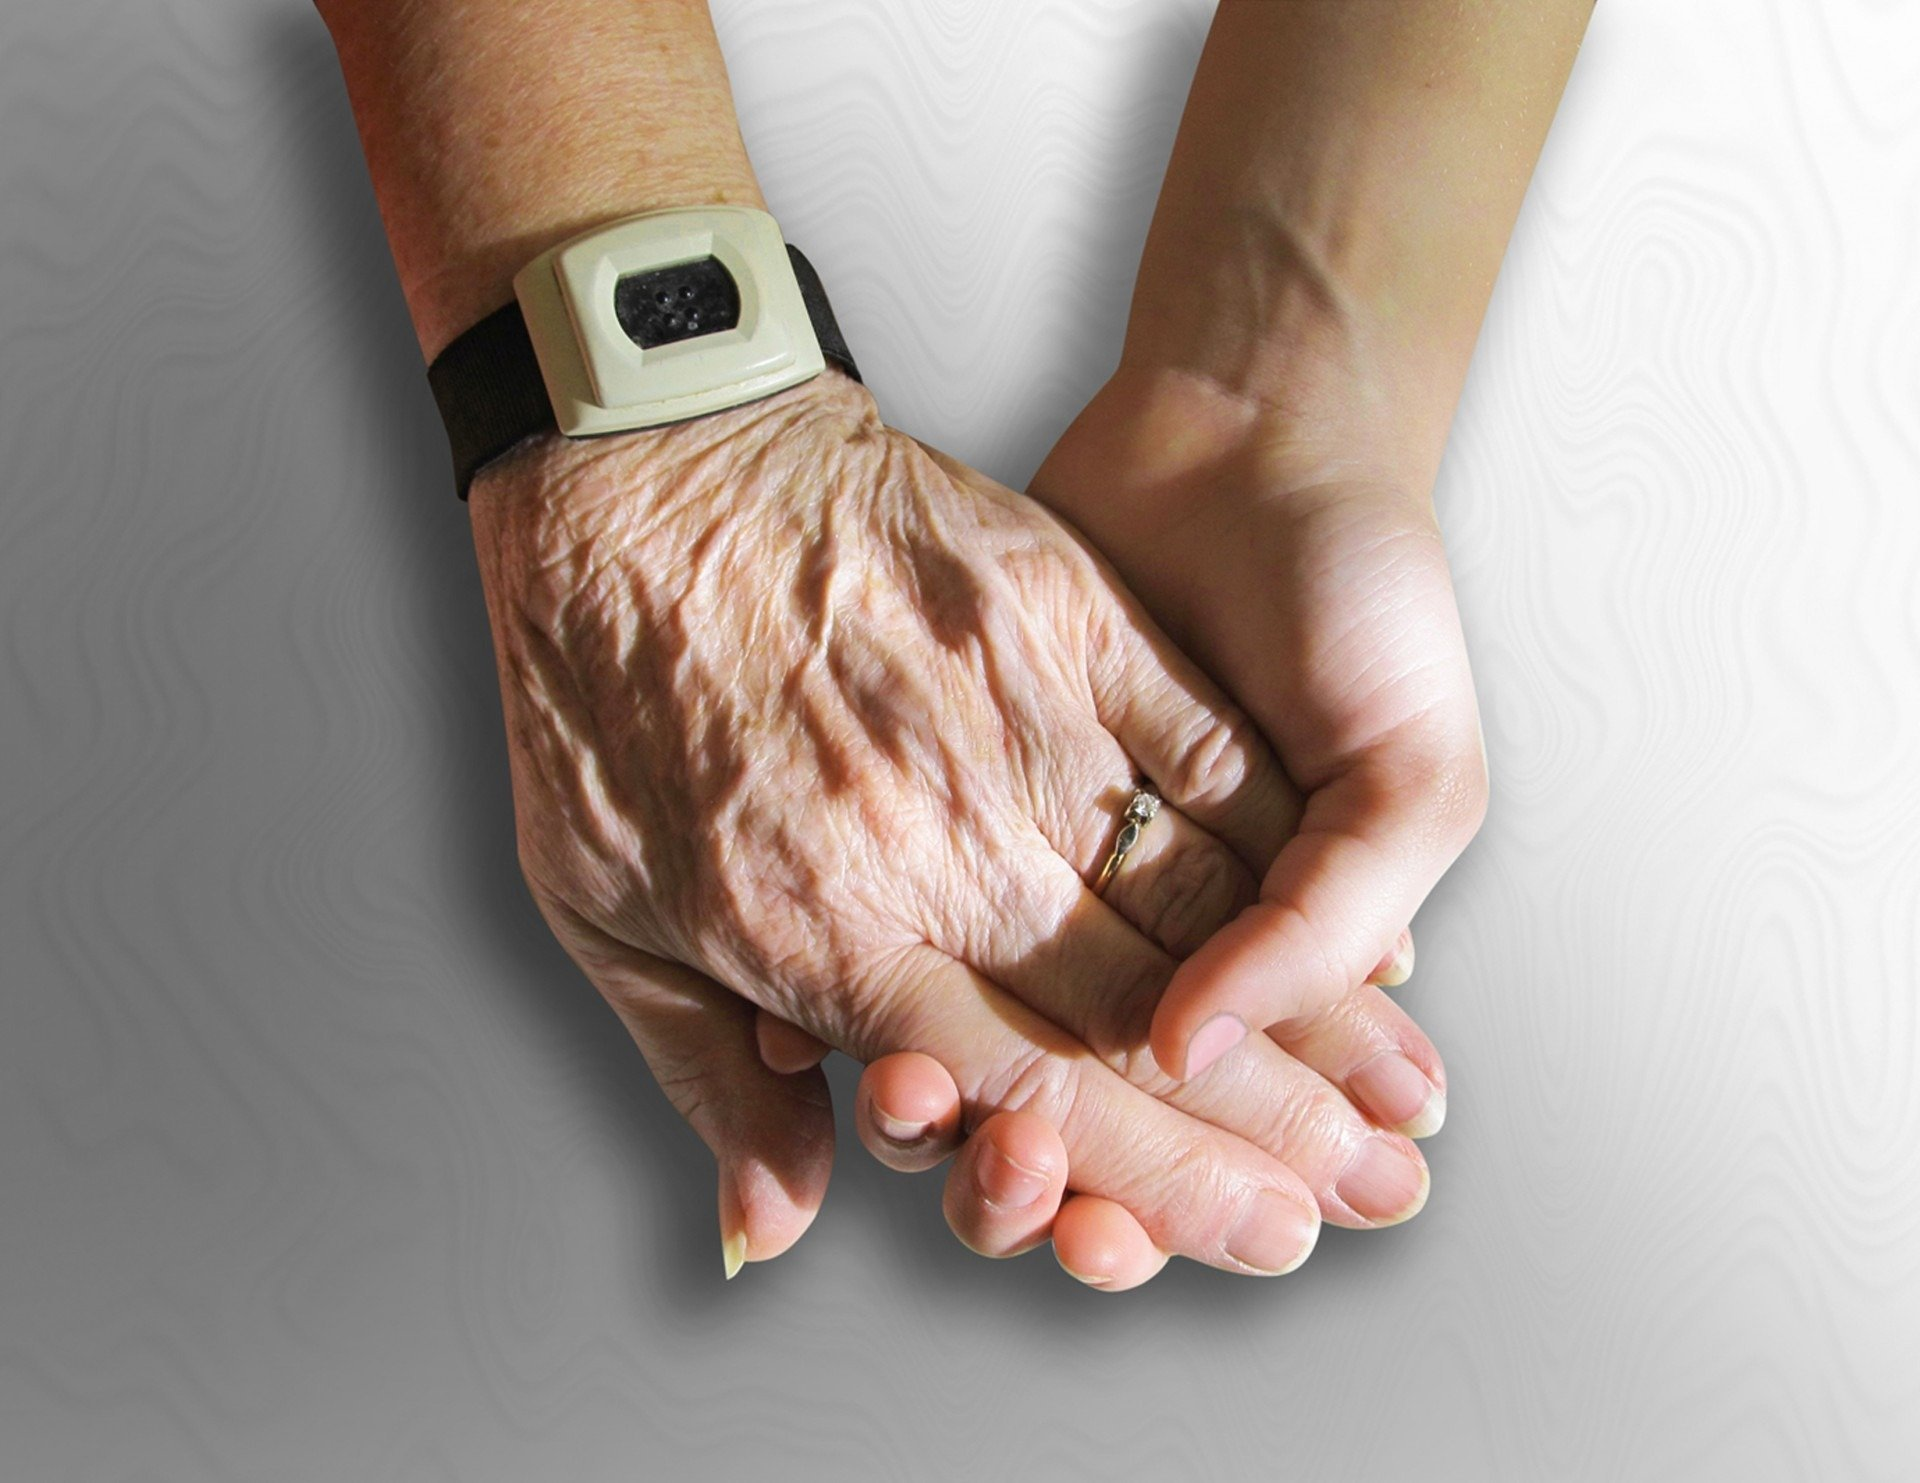 Hand Pflege PublicDomainPictures from Pixabay